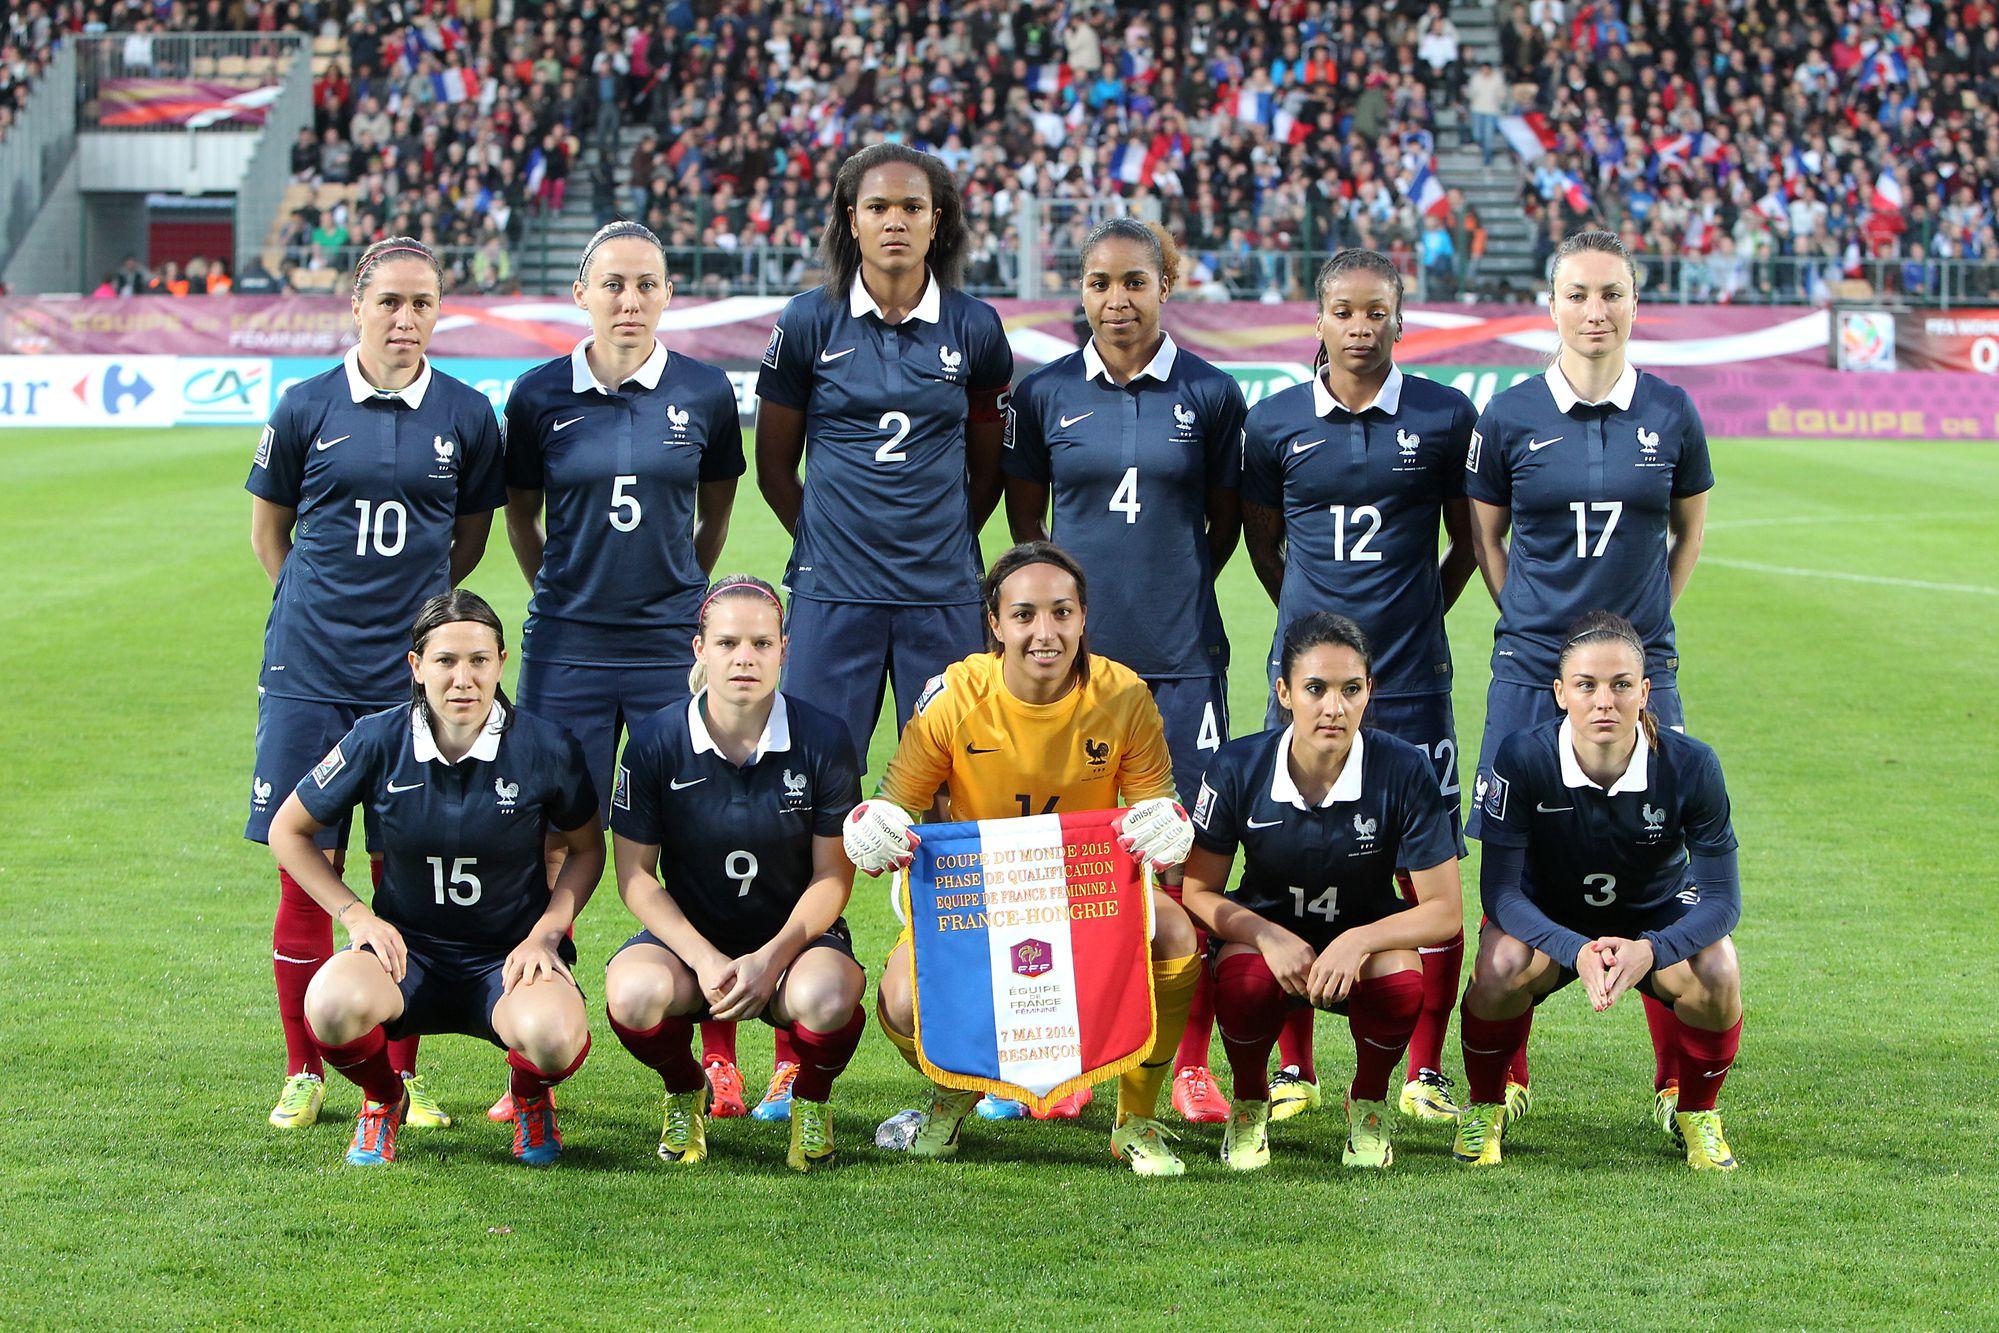 La France organisera le Mondial féminin en 2019 Equipe